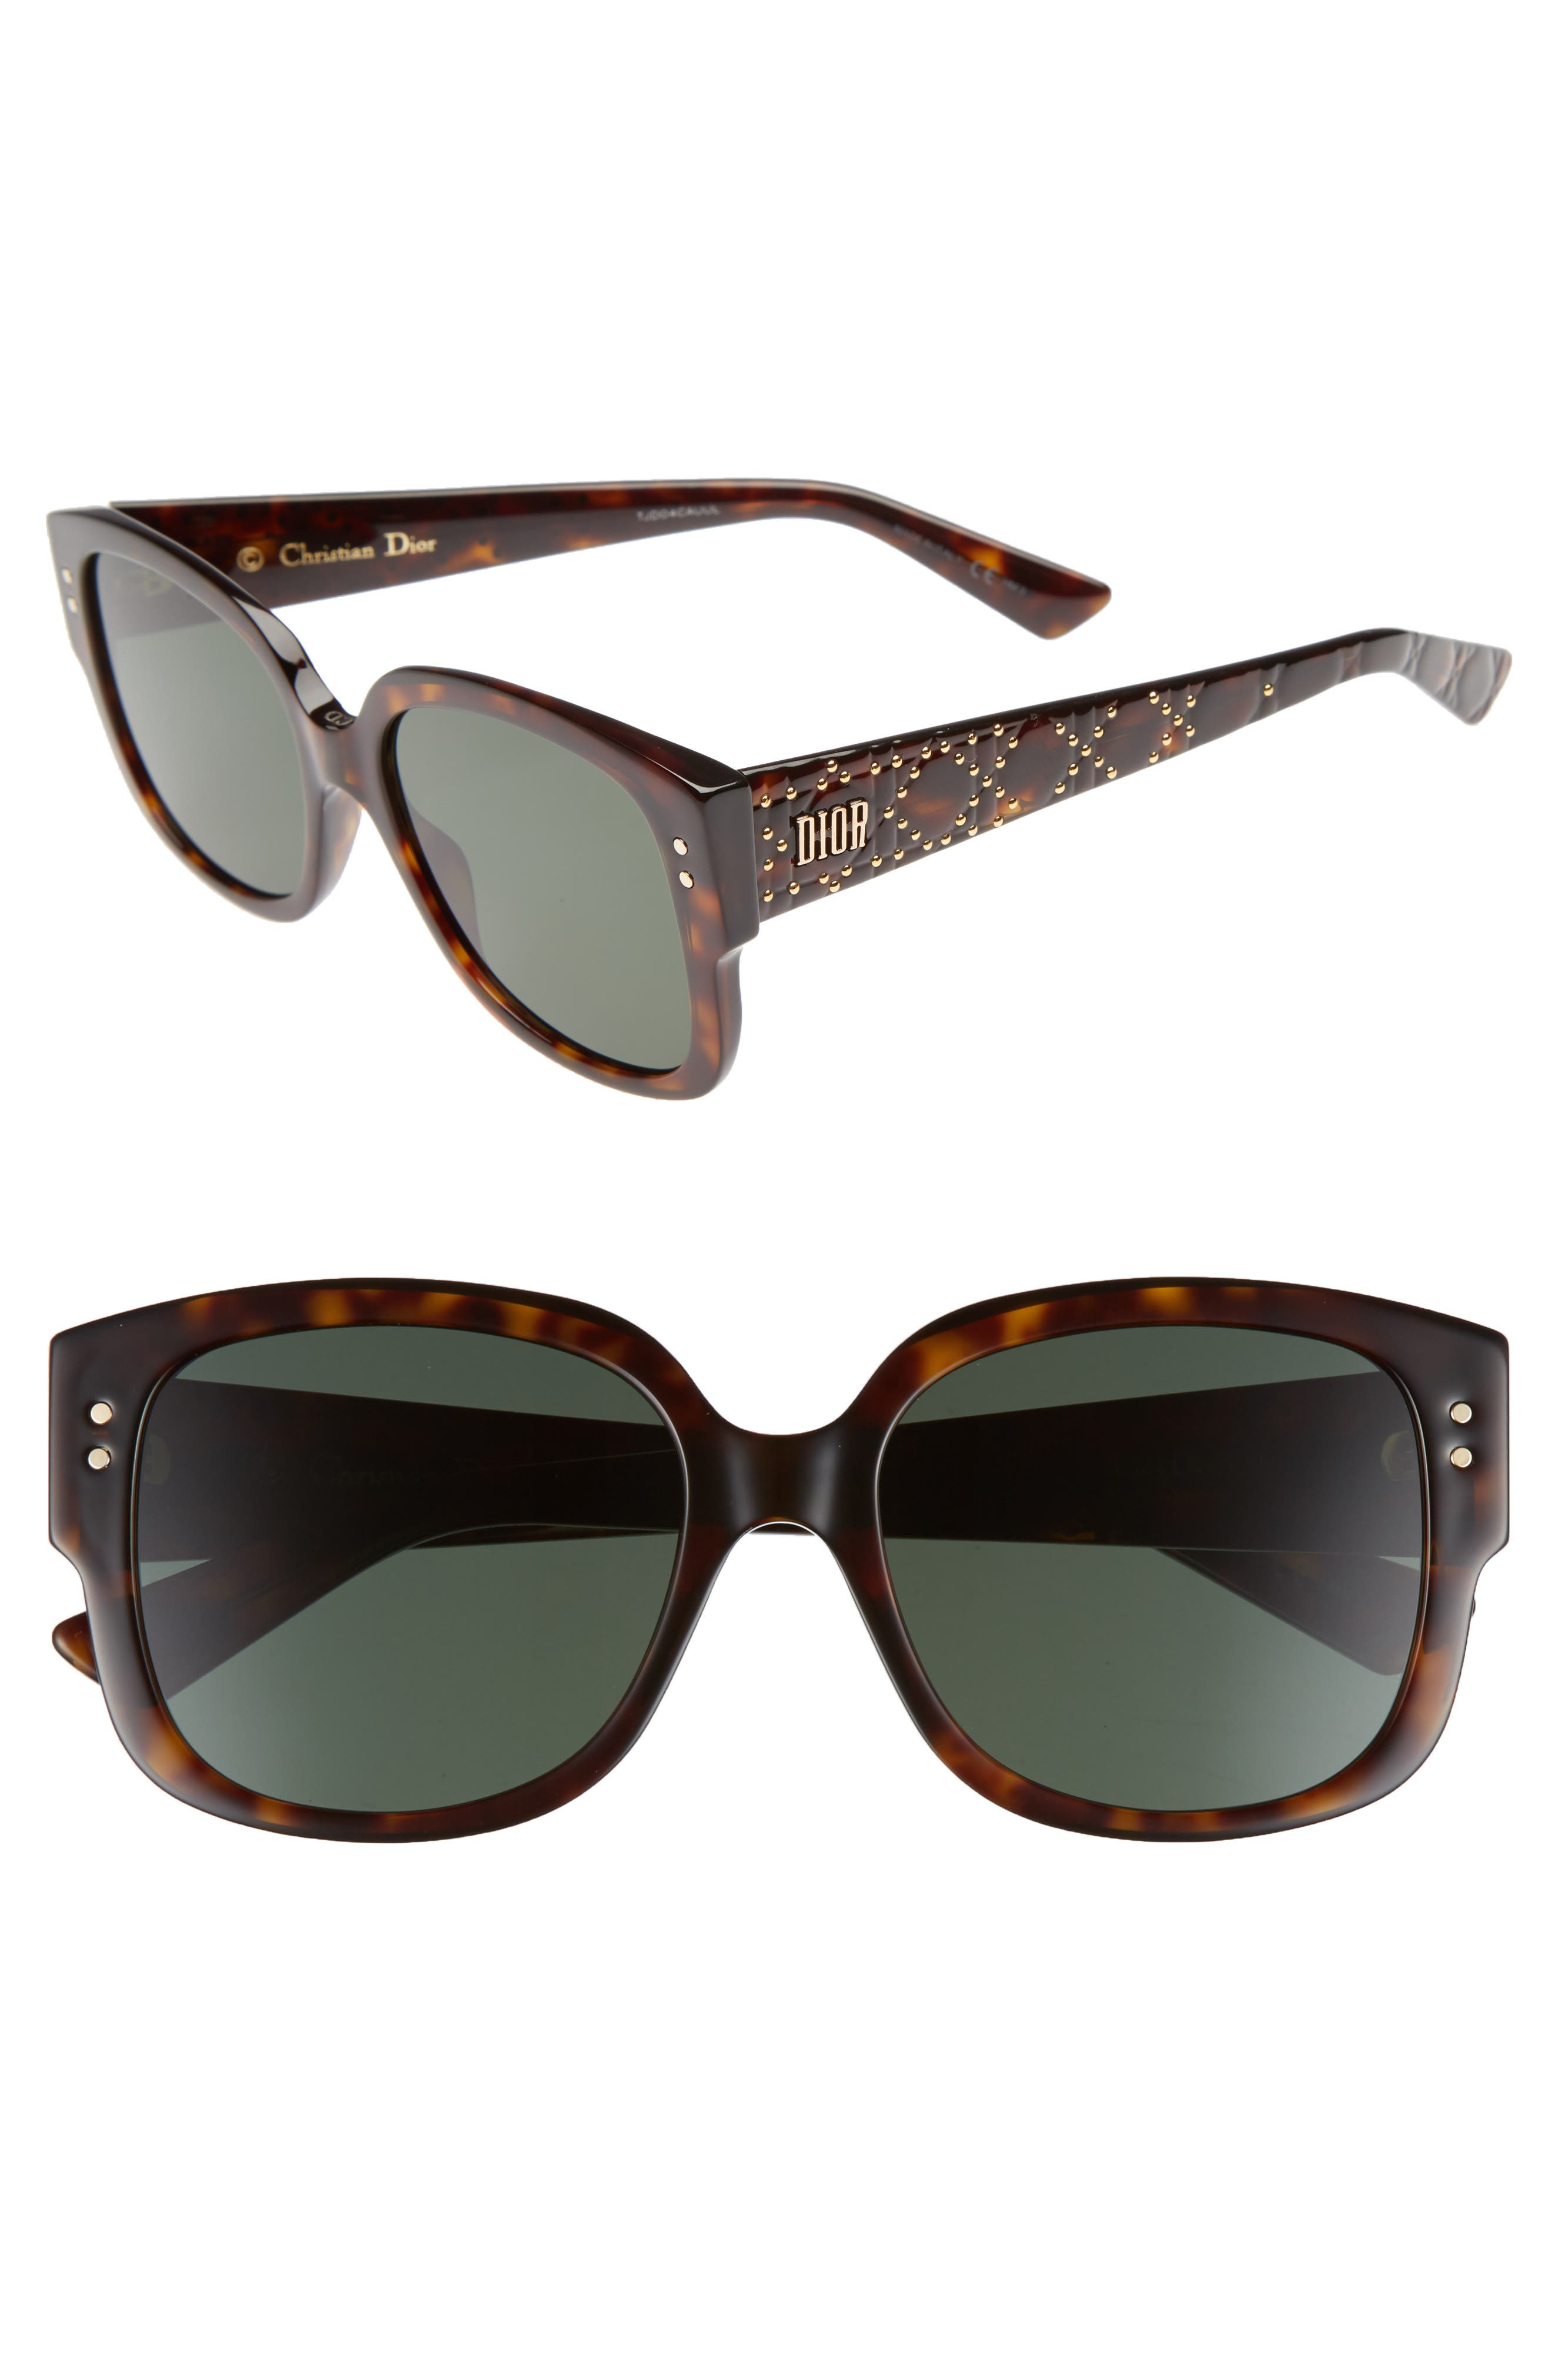 Main Image - Dior Square 54mm Sunglasses